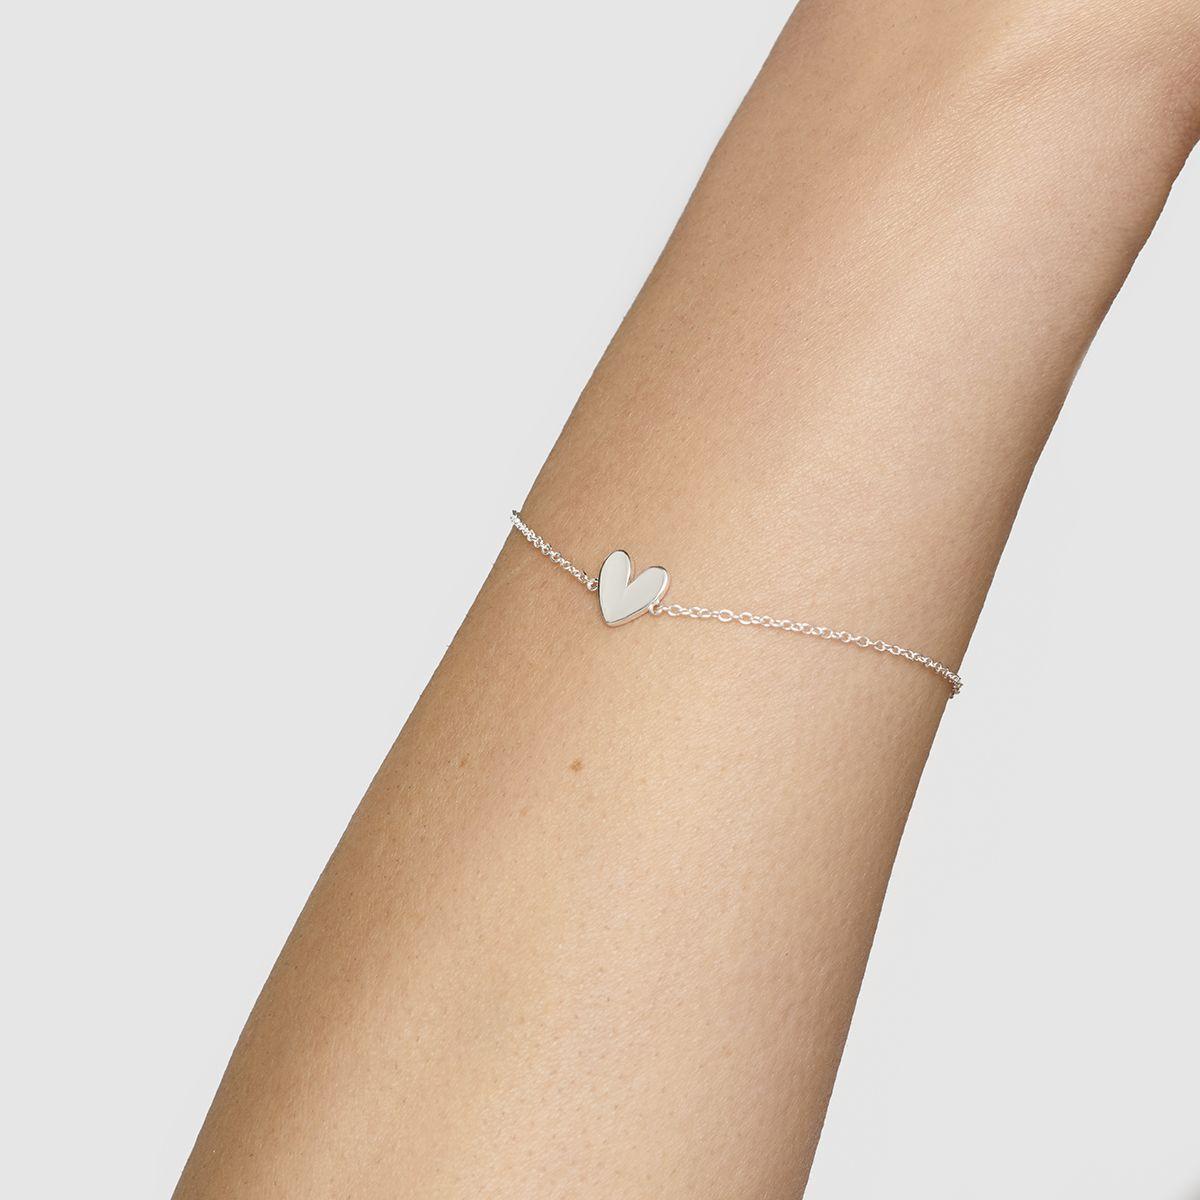 Maeva - Armband - 18k vergoldet